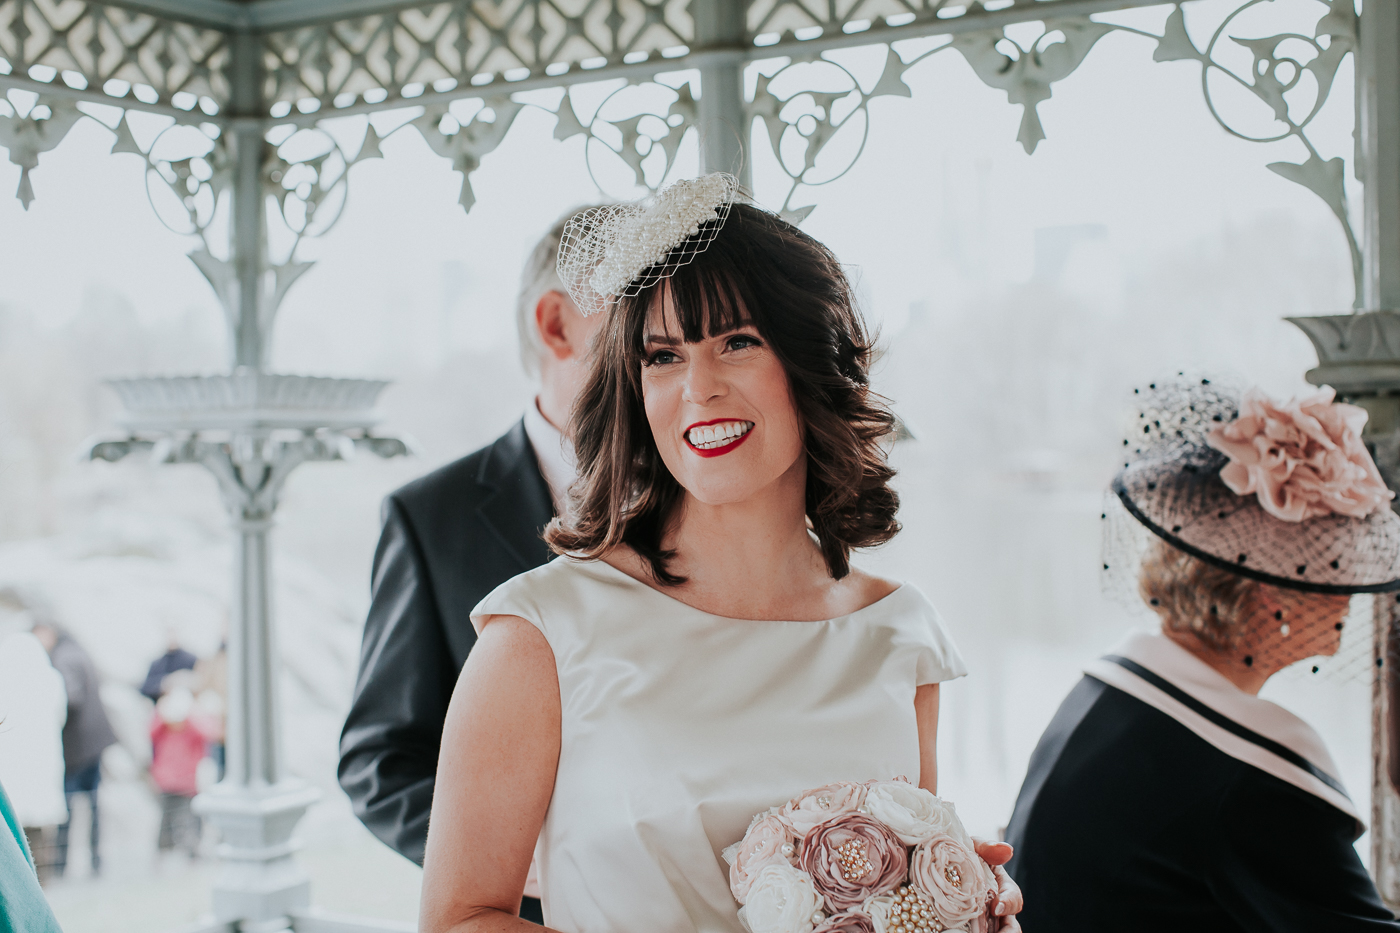 Ladies-Pavilion-Central-Park-NYC-Documentary-Elopement-Wedding-Photographer-25.jpg